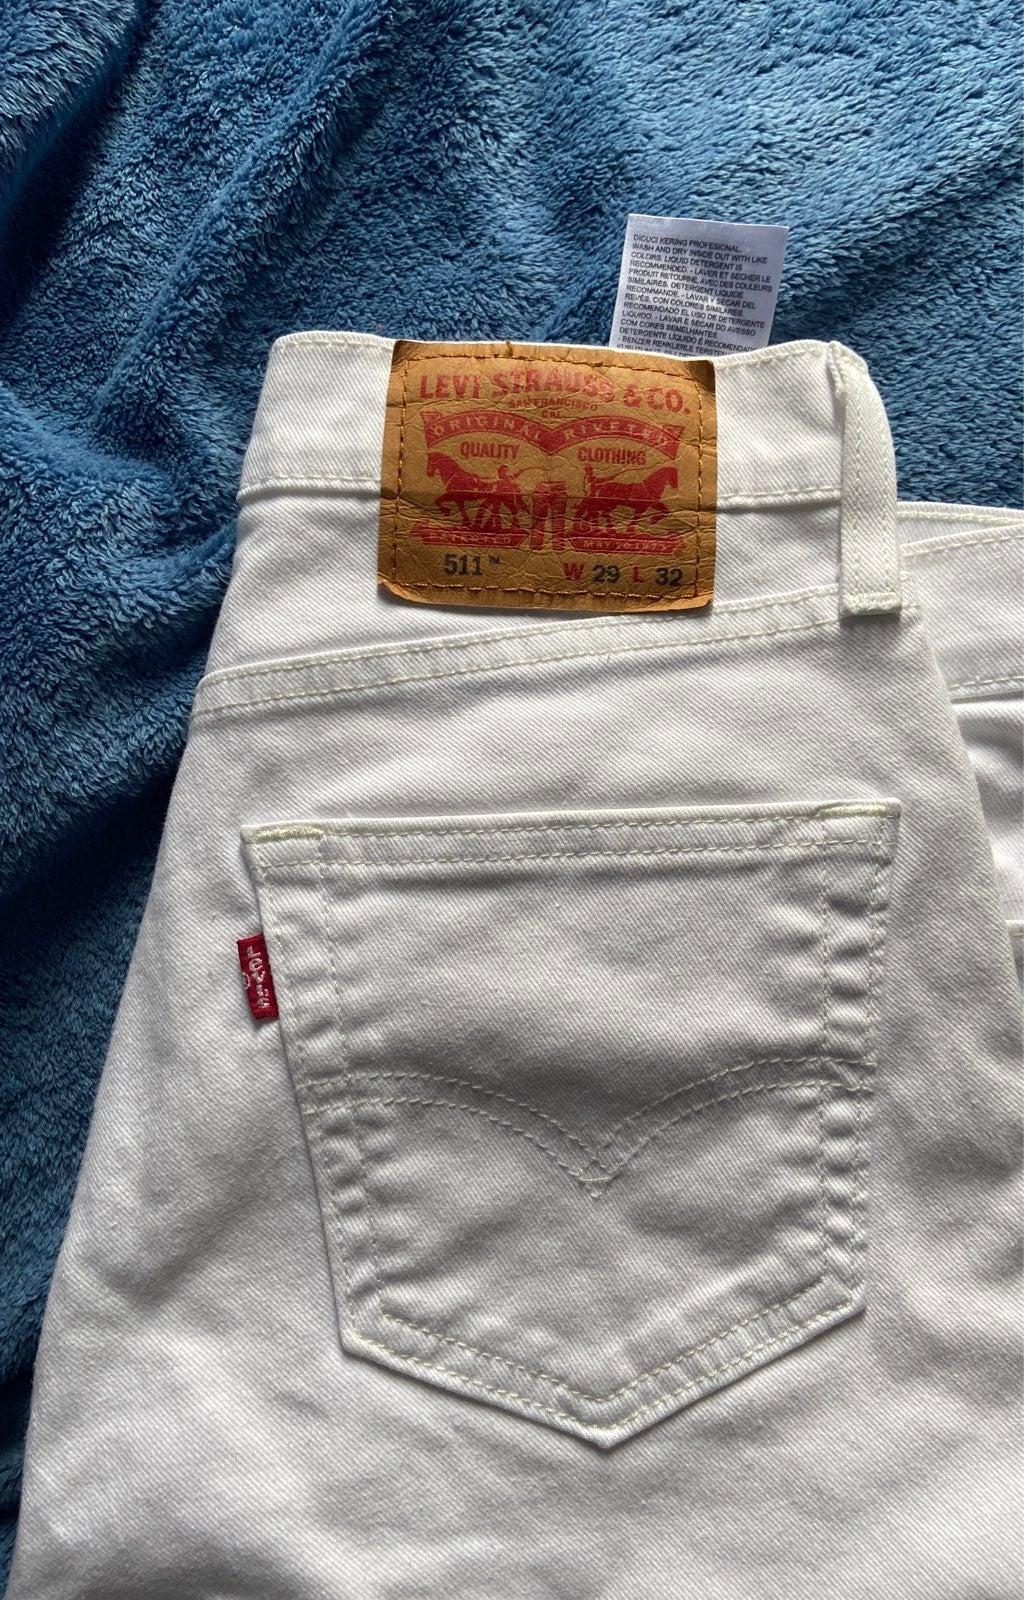 levi jeans mens 511 W29 L32